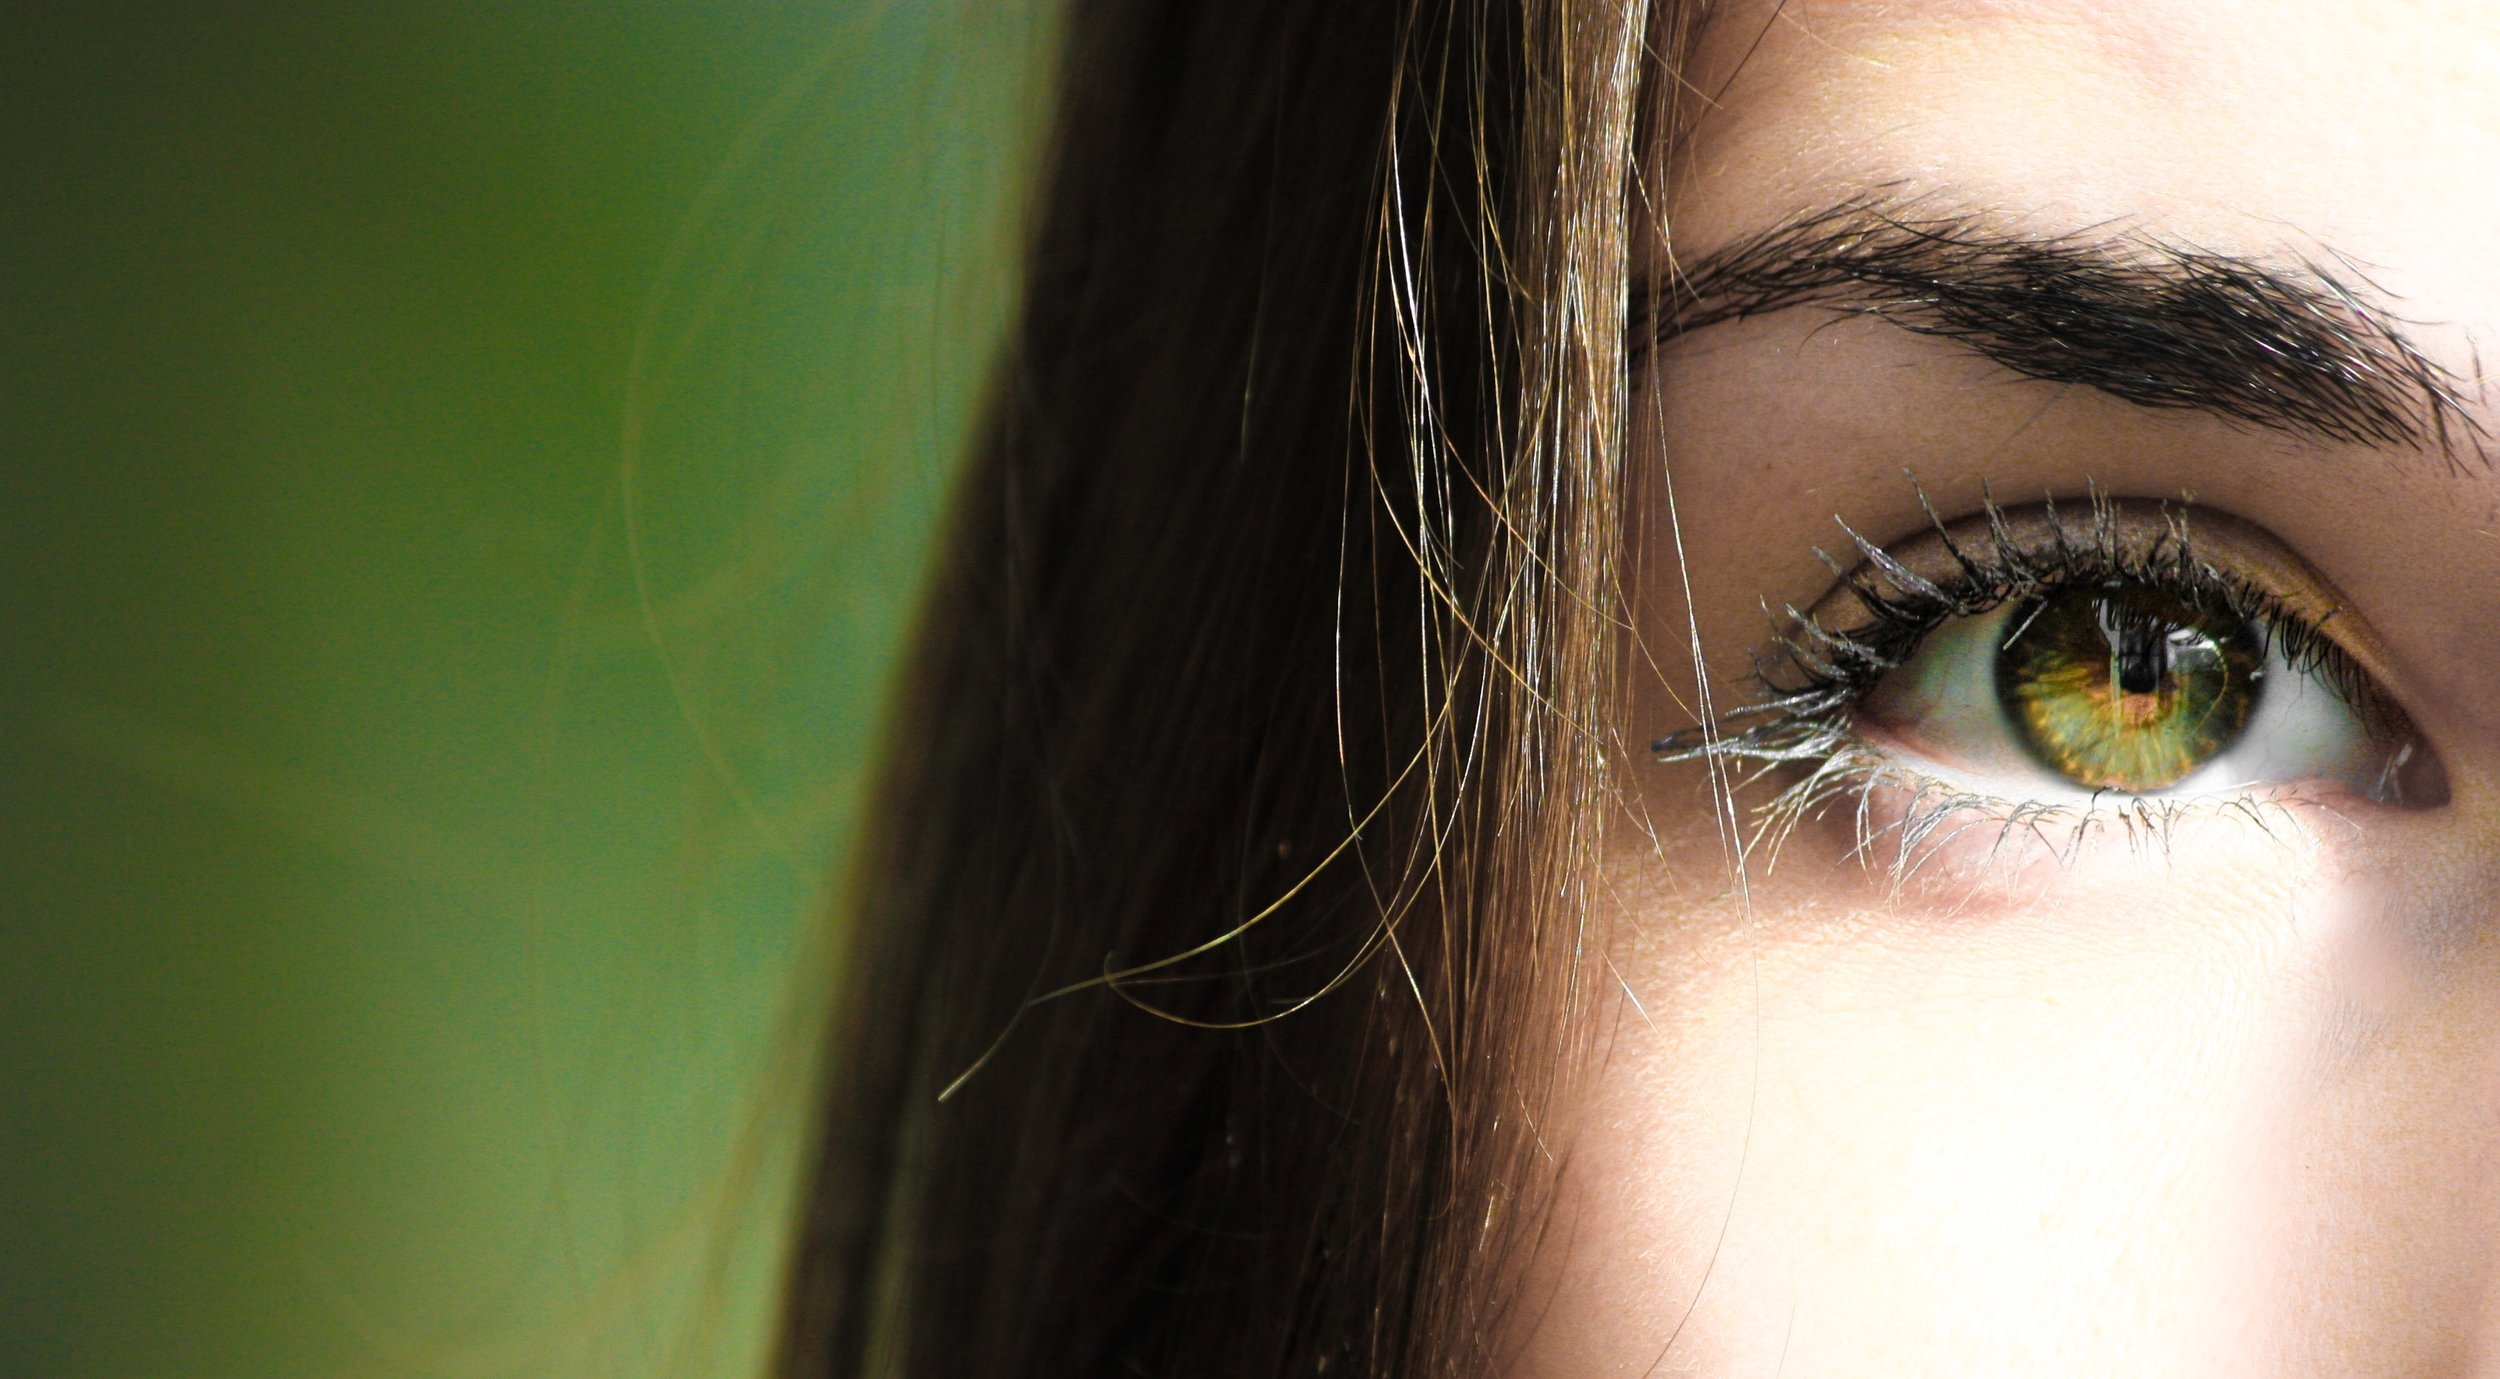 close-up-eye-eye-lashes-840810.jpg